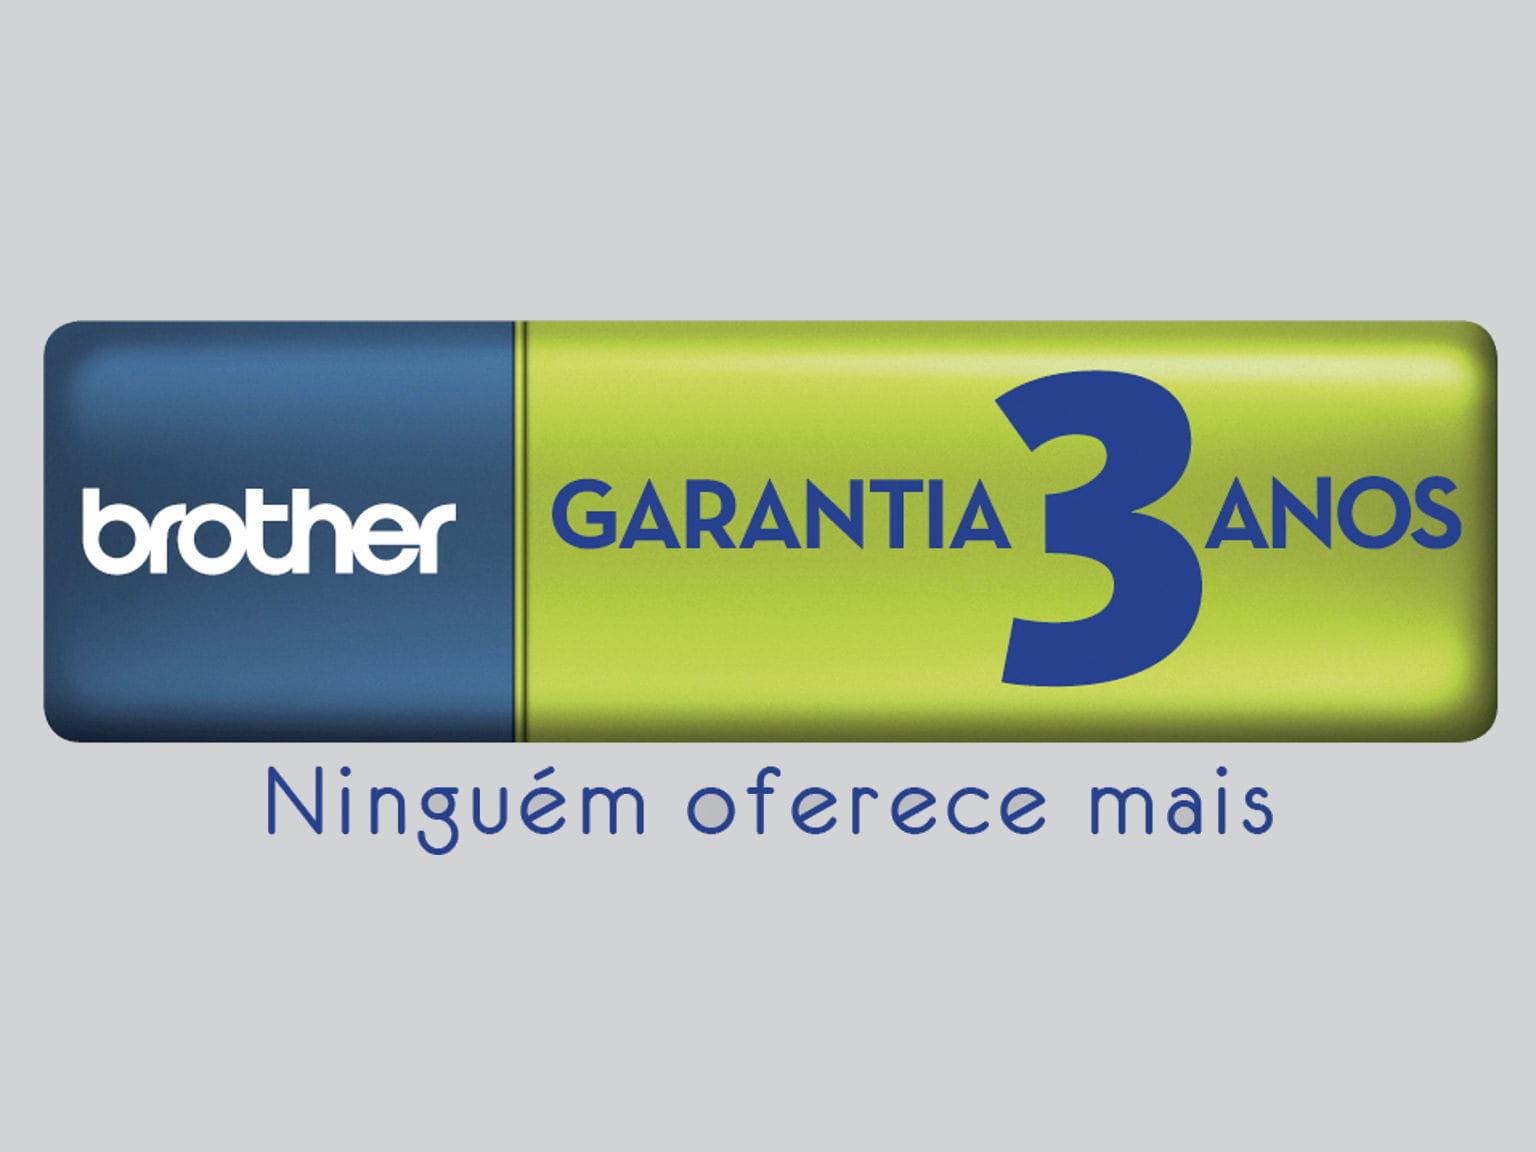 Brother Garantia 3 anos